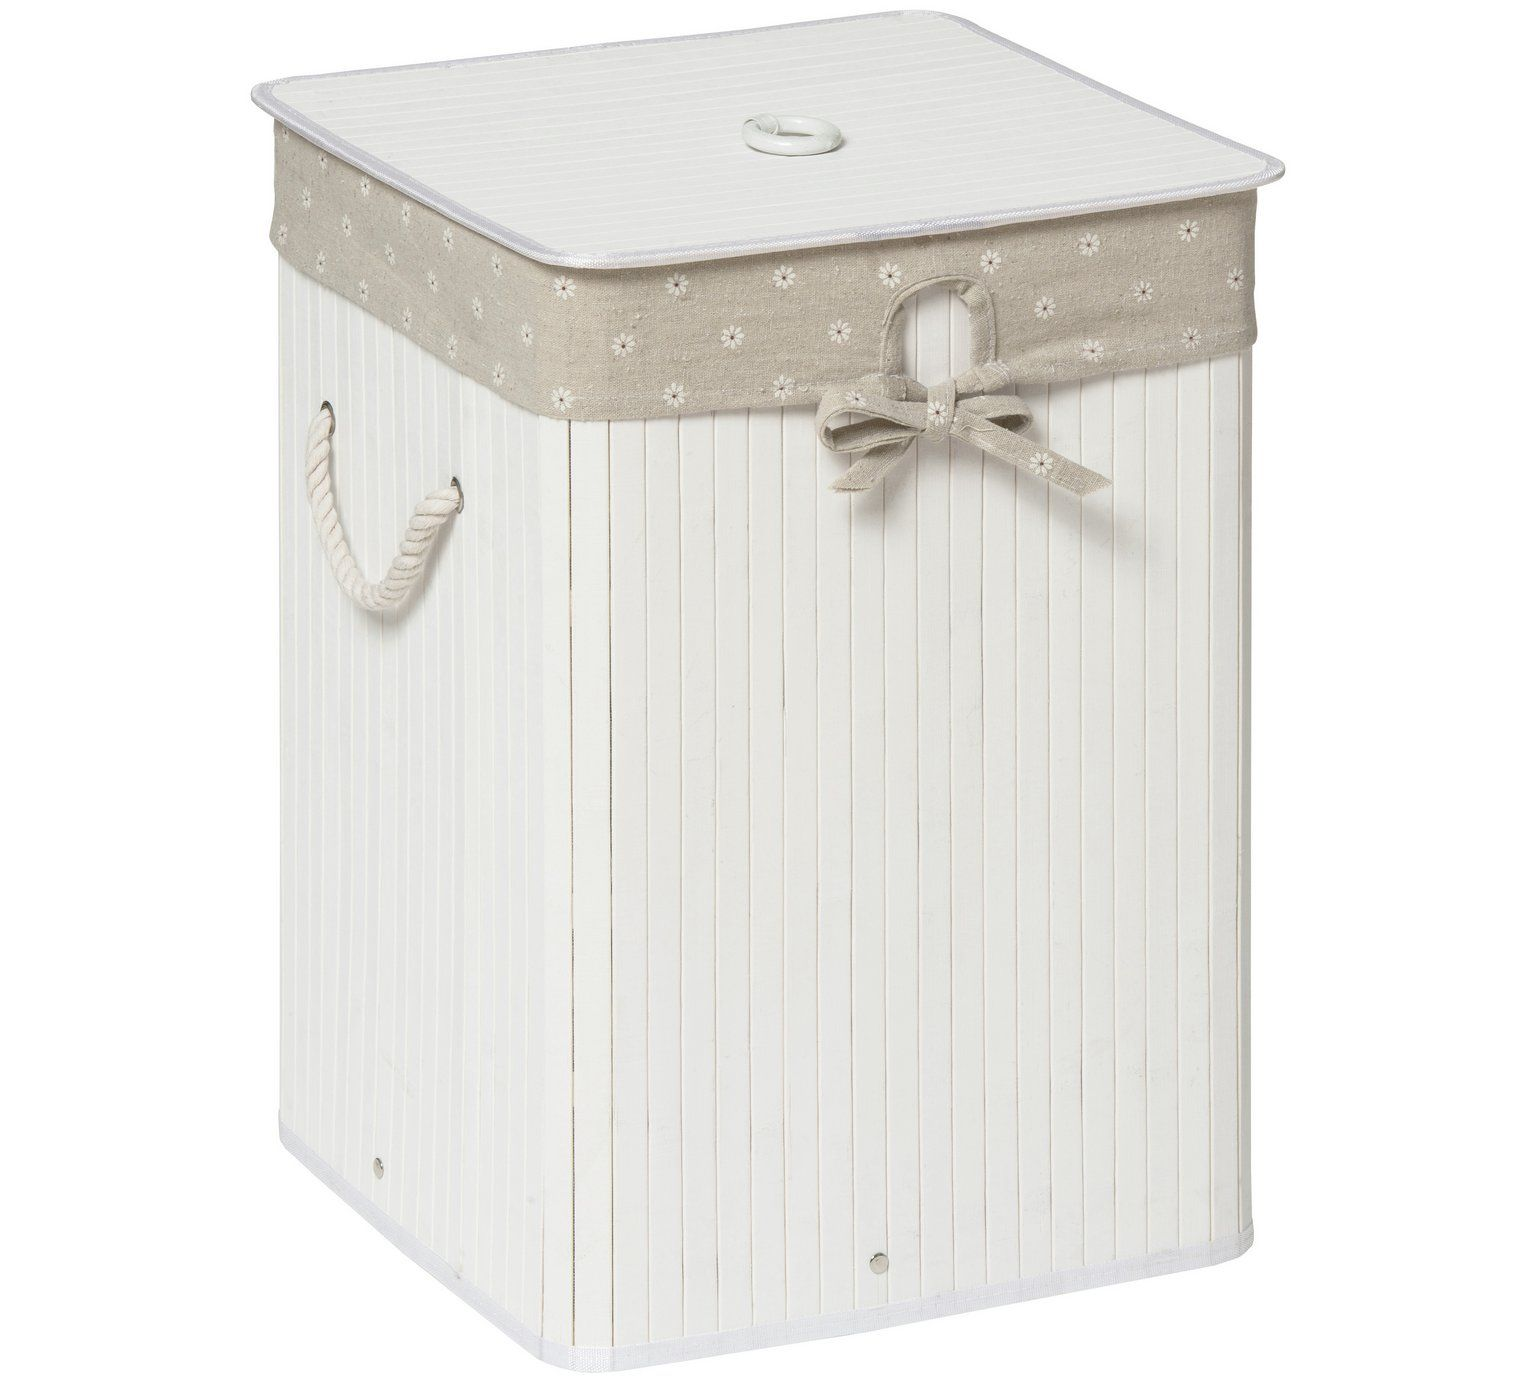 Buy Premier Housewares Kankyo 62L Square Laundry Hamper ...